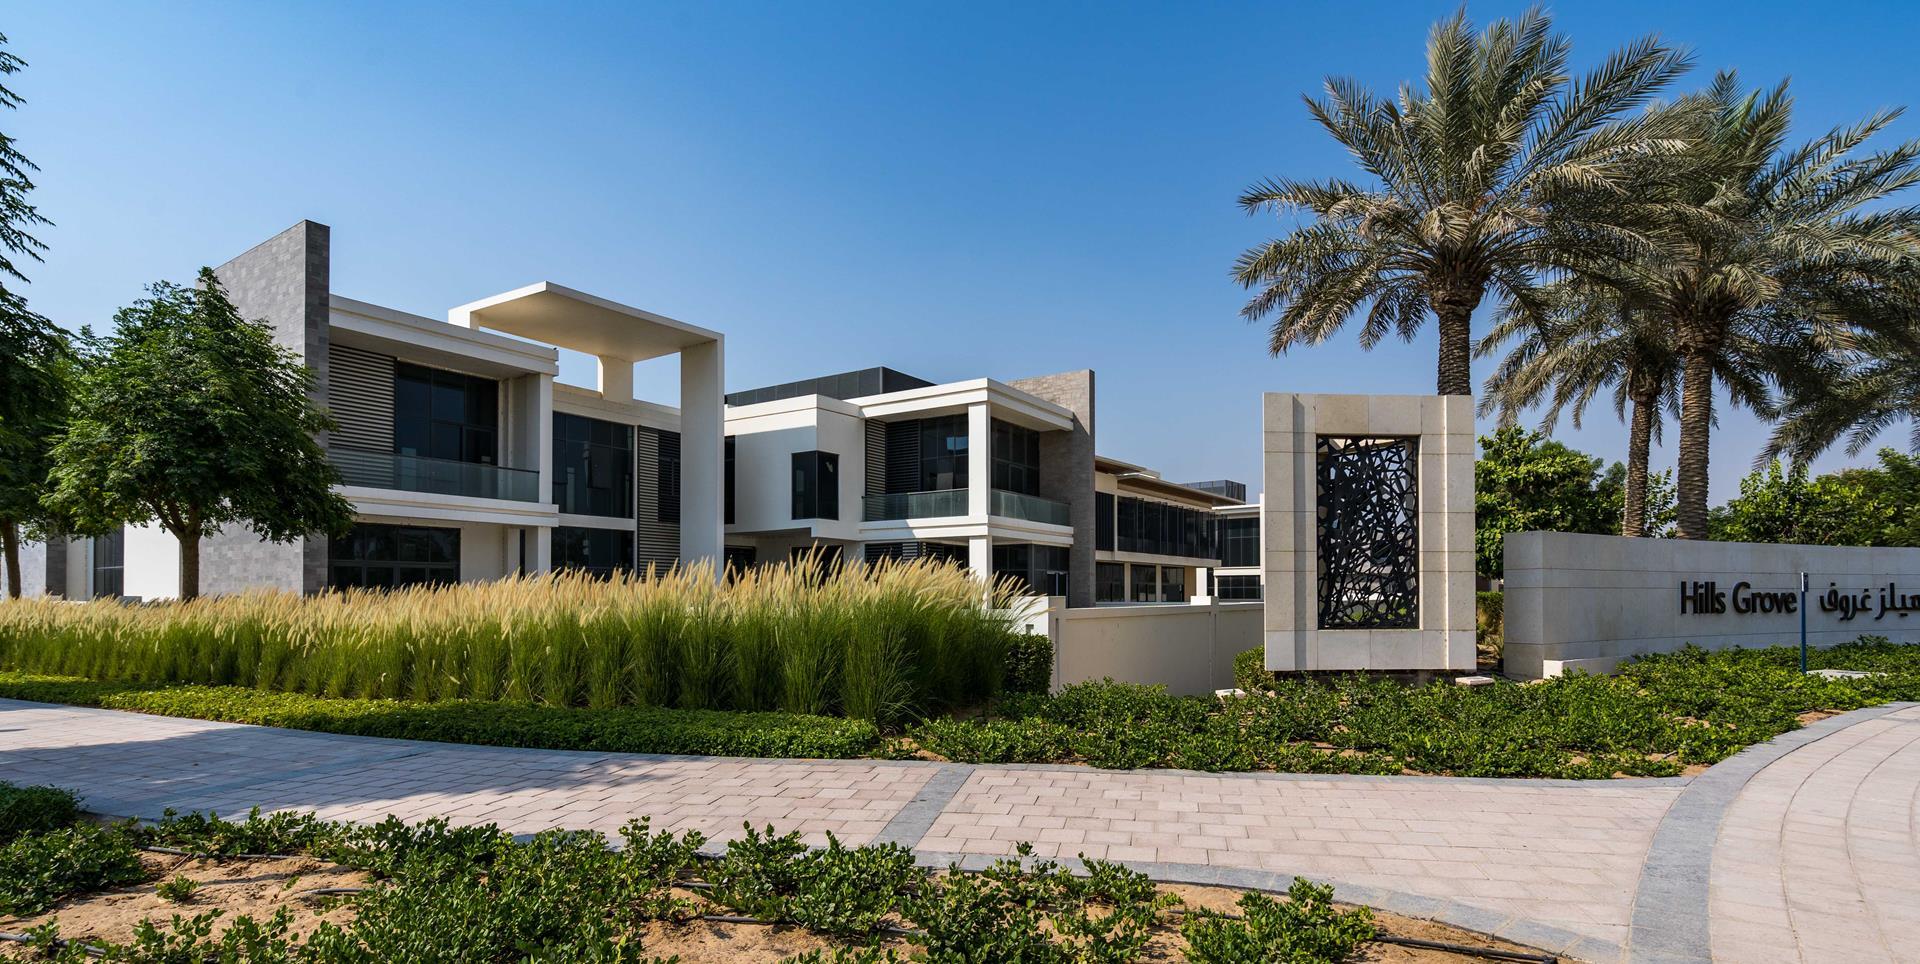 Dubai Hills Mansion